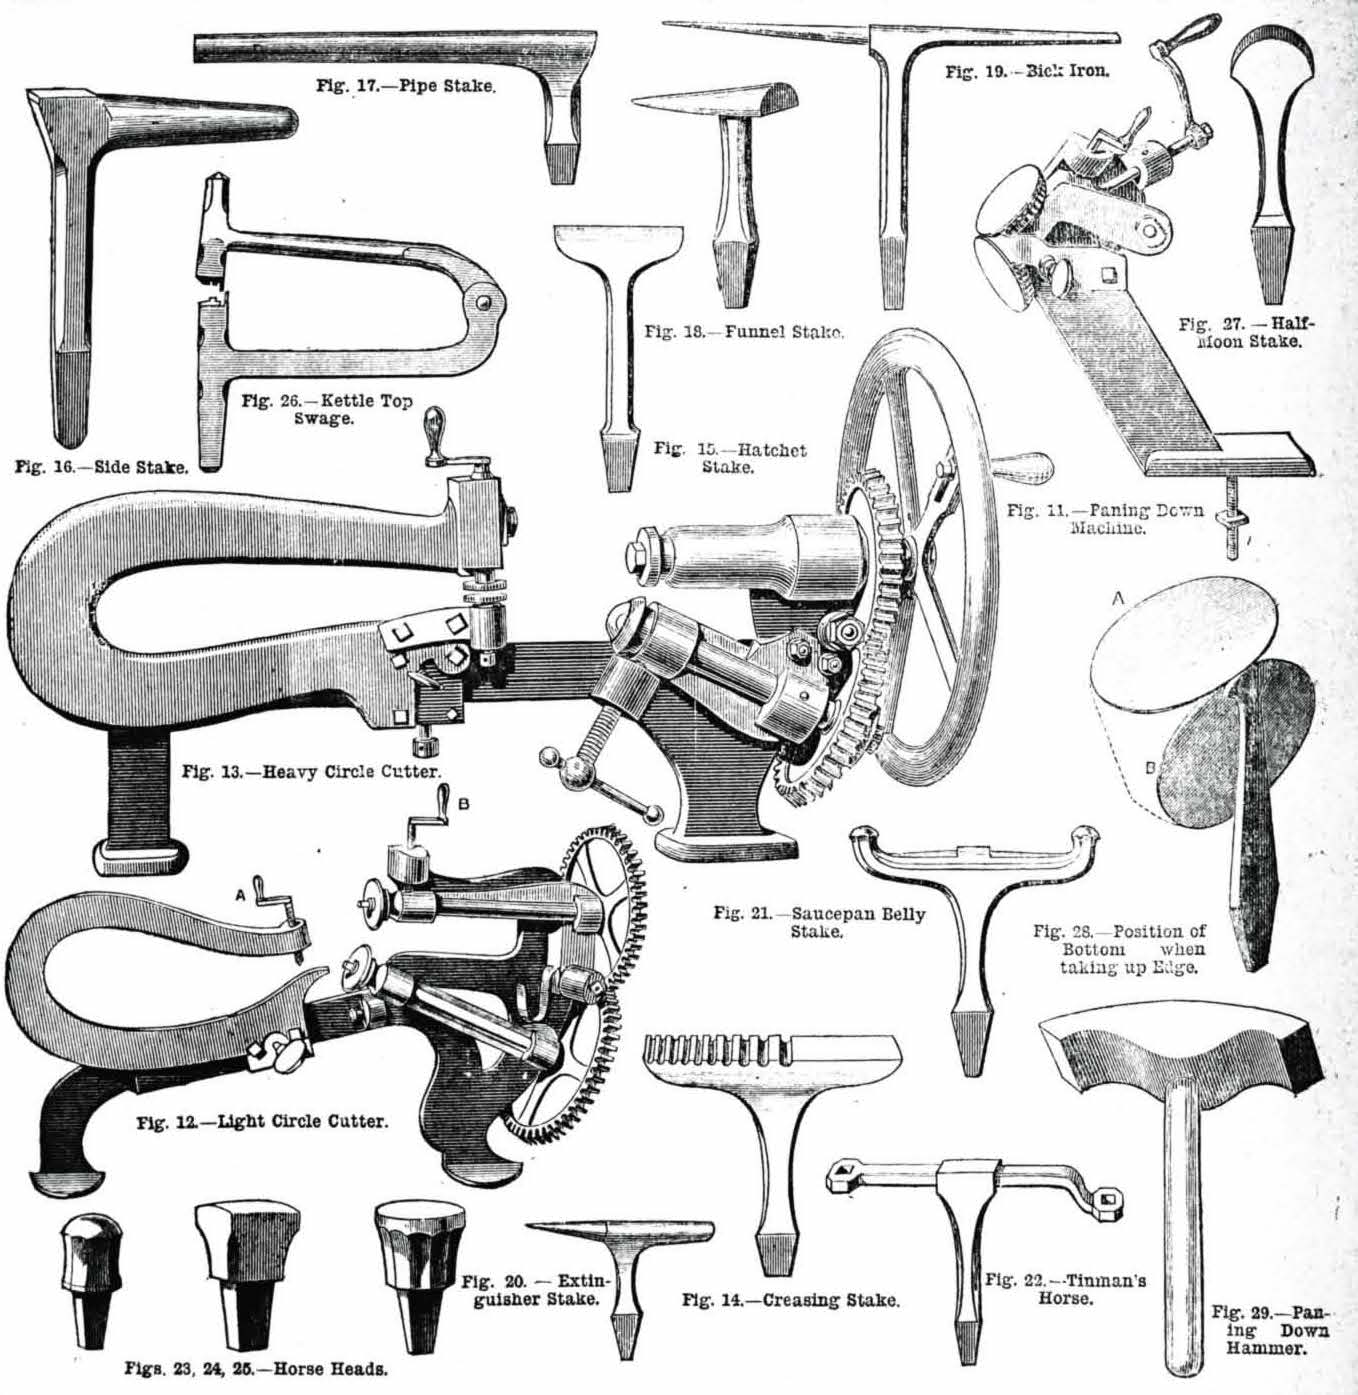 19th Century Sheet Metal Tools Preindustrial Craftsmanship